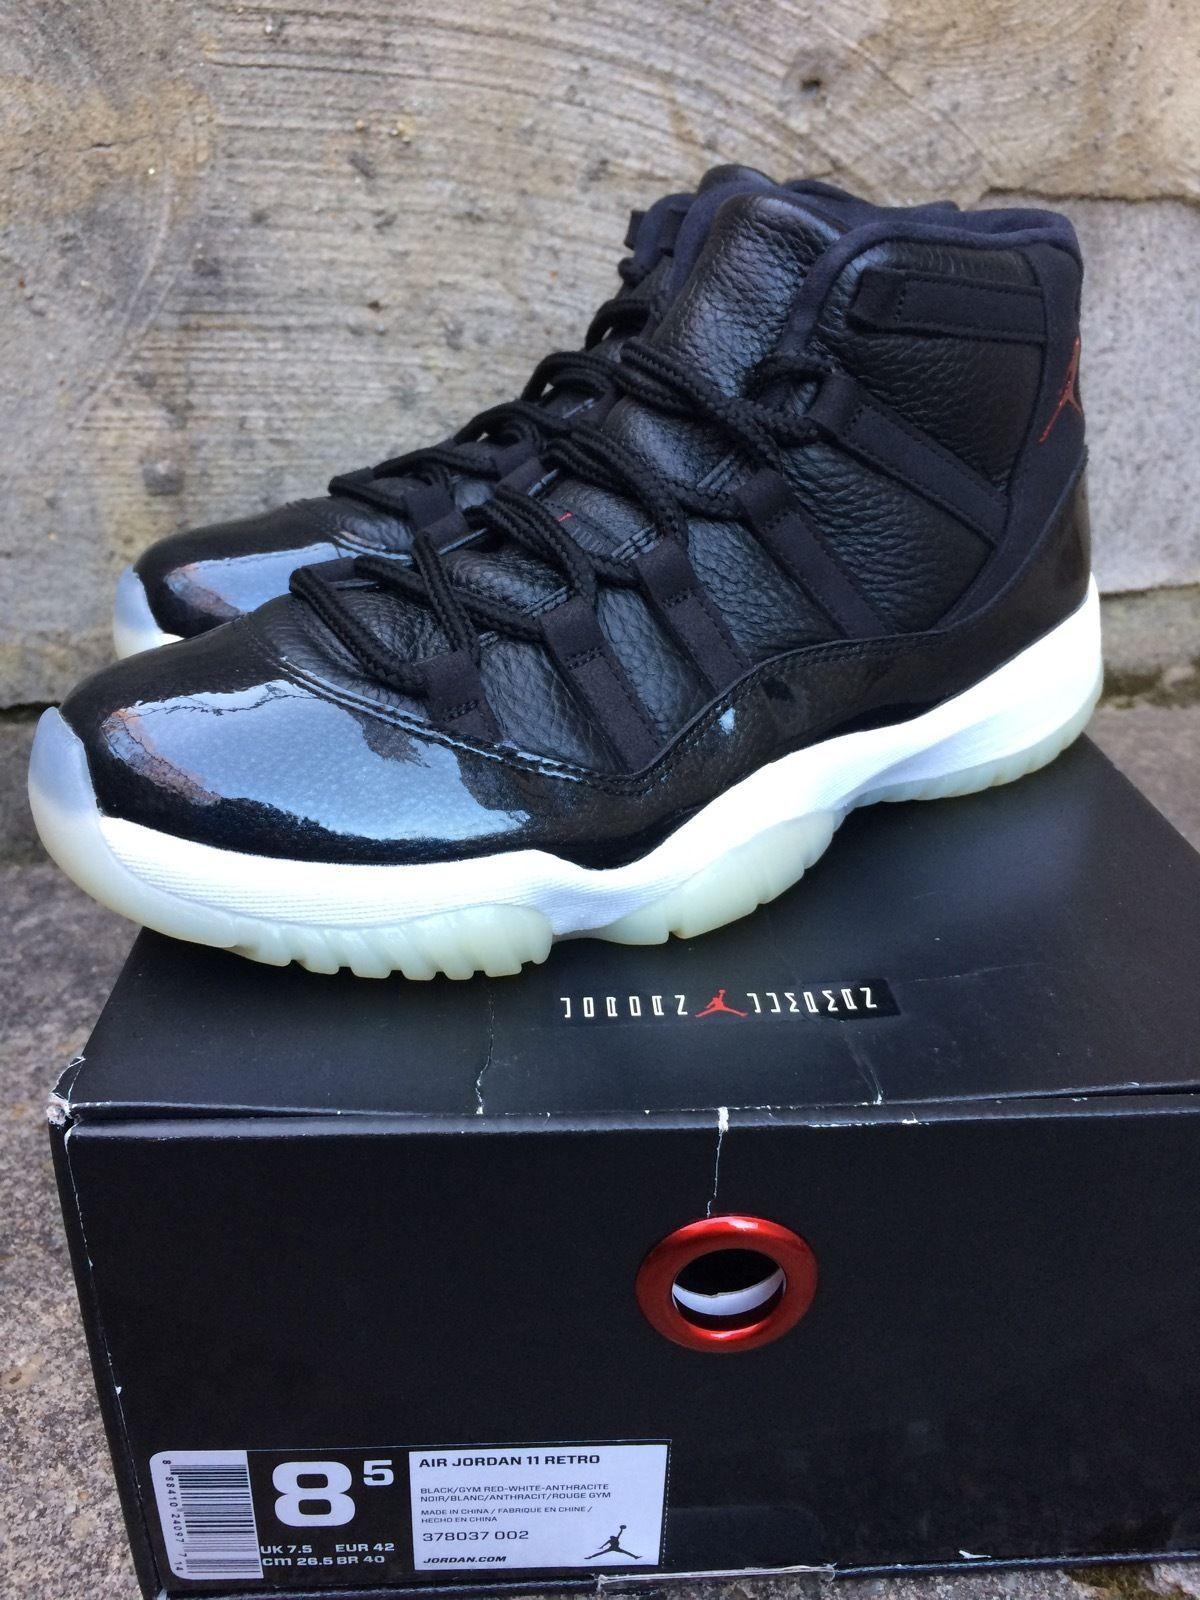 buy popular 2bf64 aa4d1 Nike Air Jordan 11 XI Retro 72-10 Black White Red size 8.5